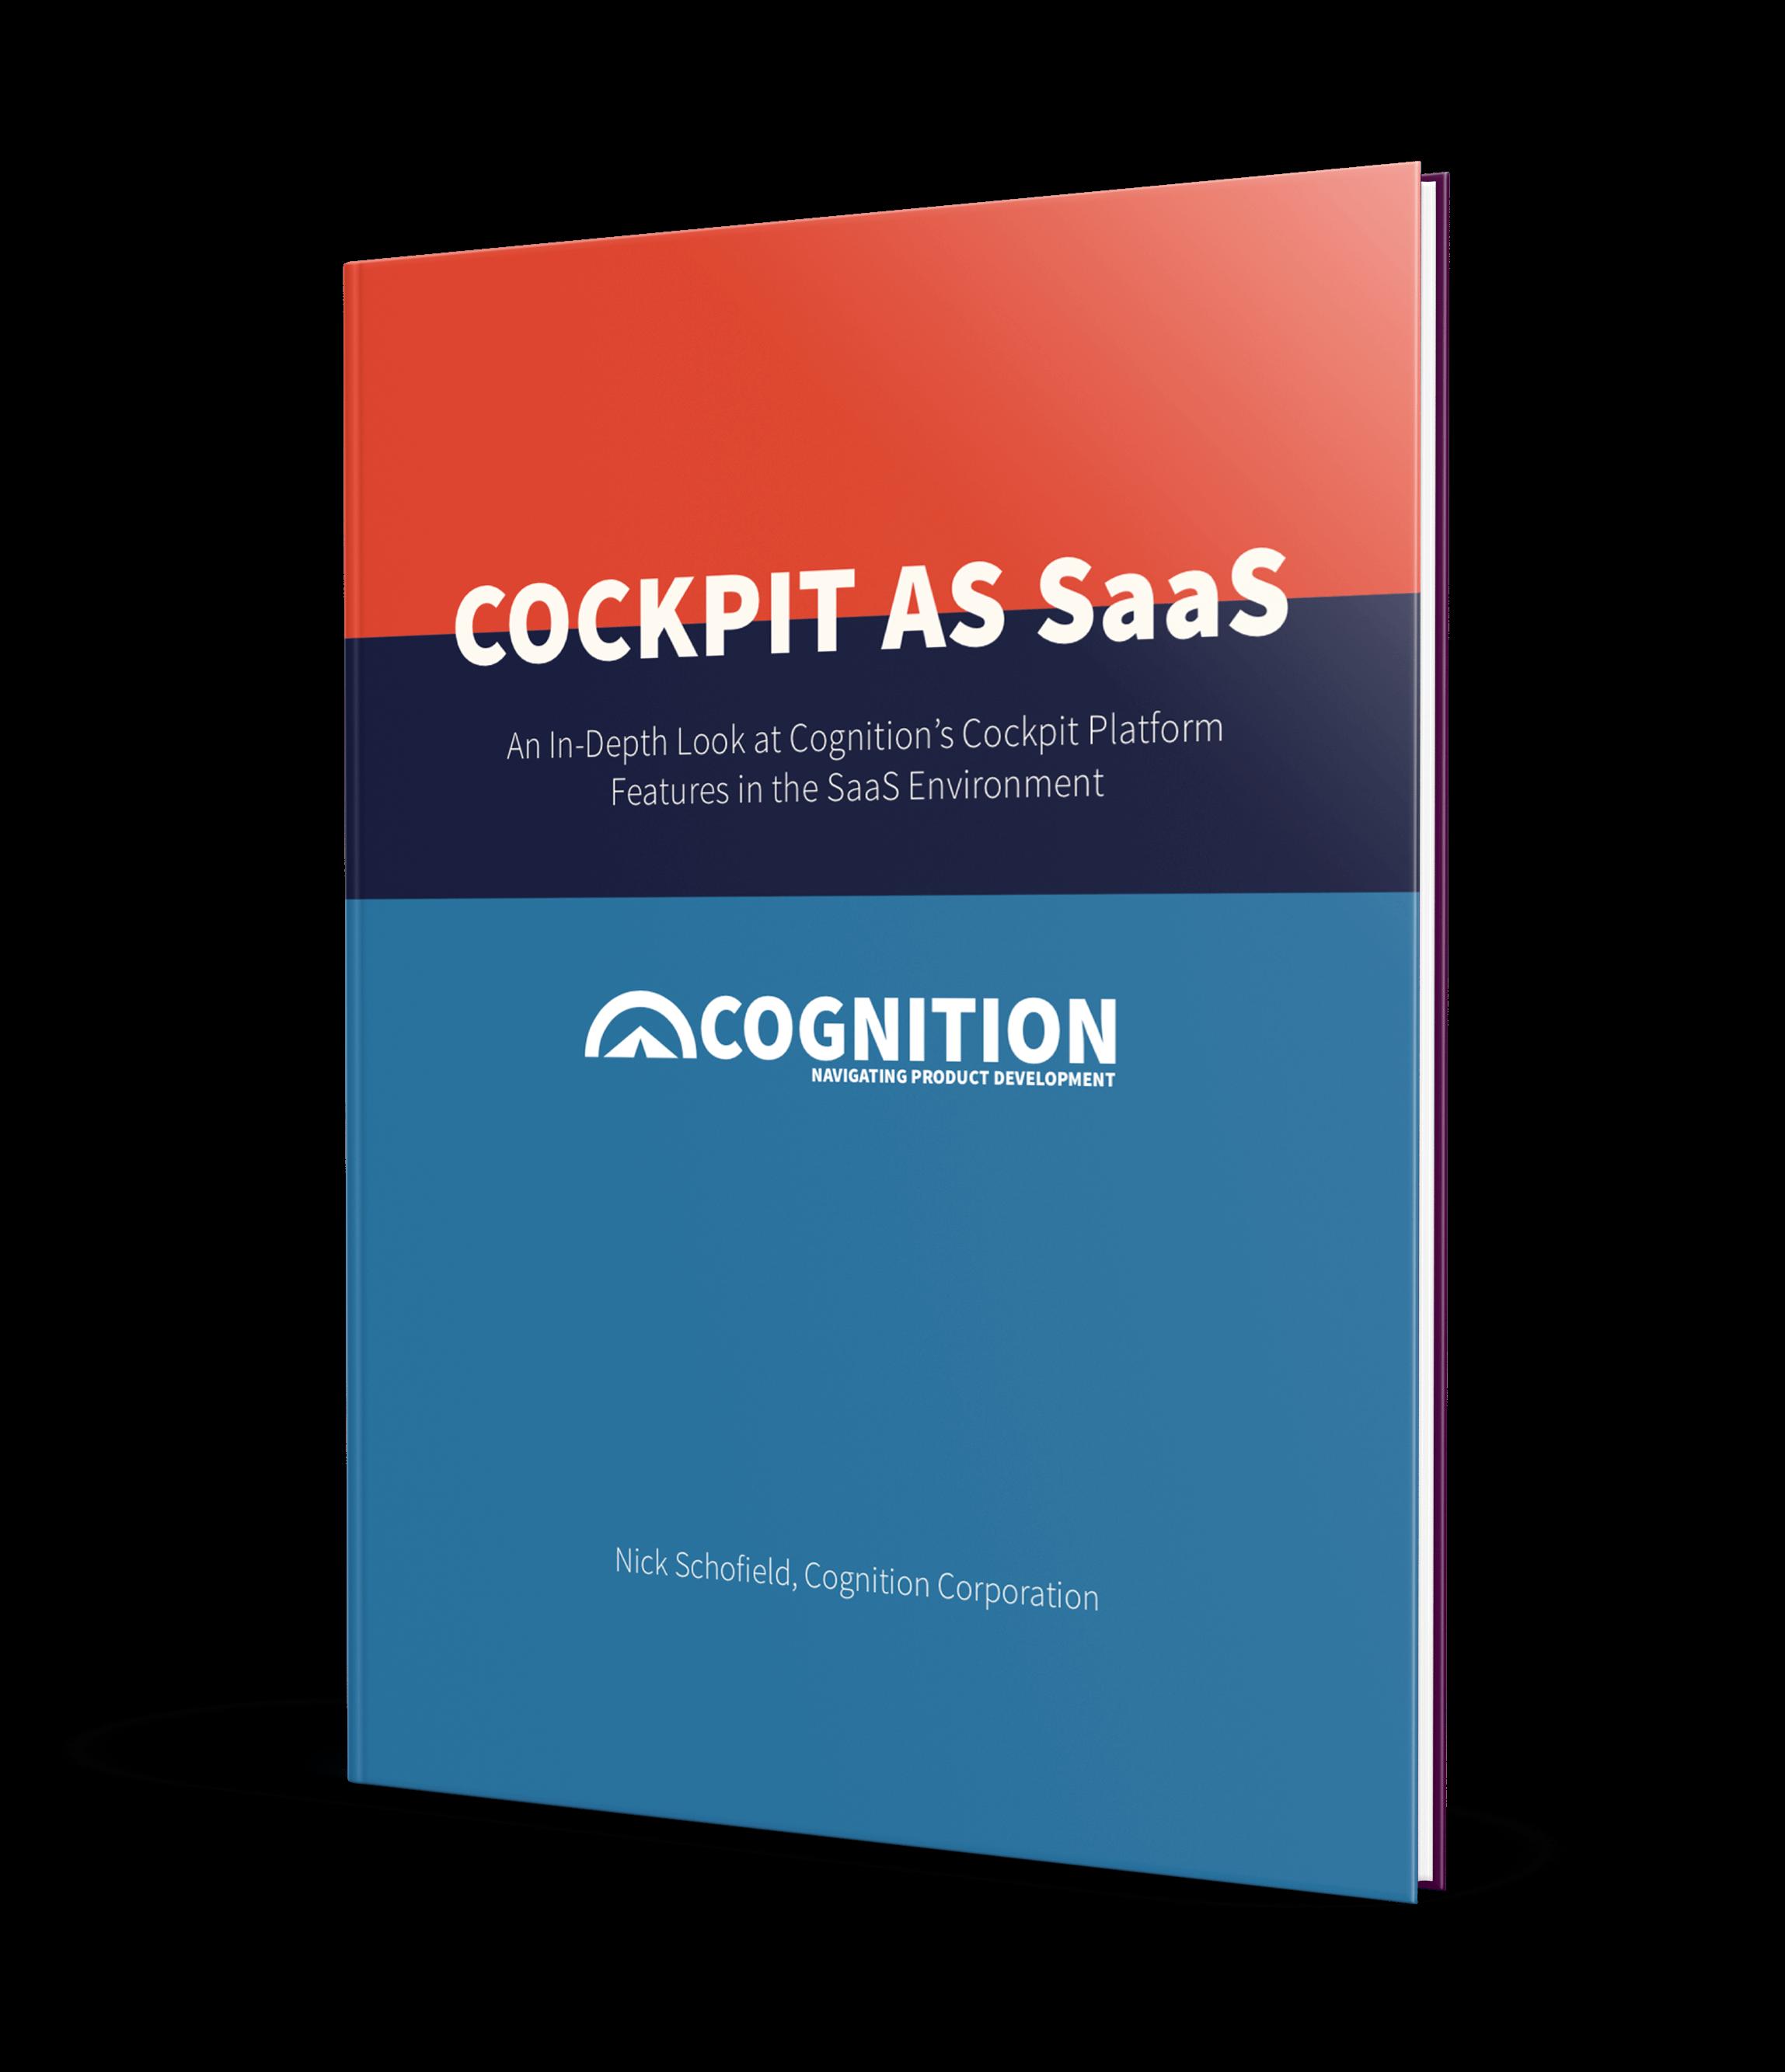 Cognition Corporation White Paper: Cockpit as SaaS